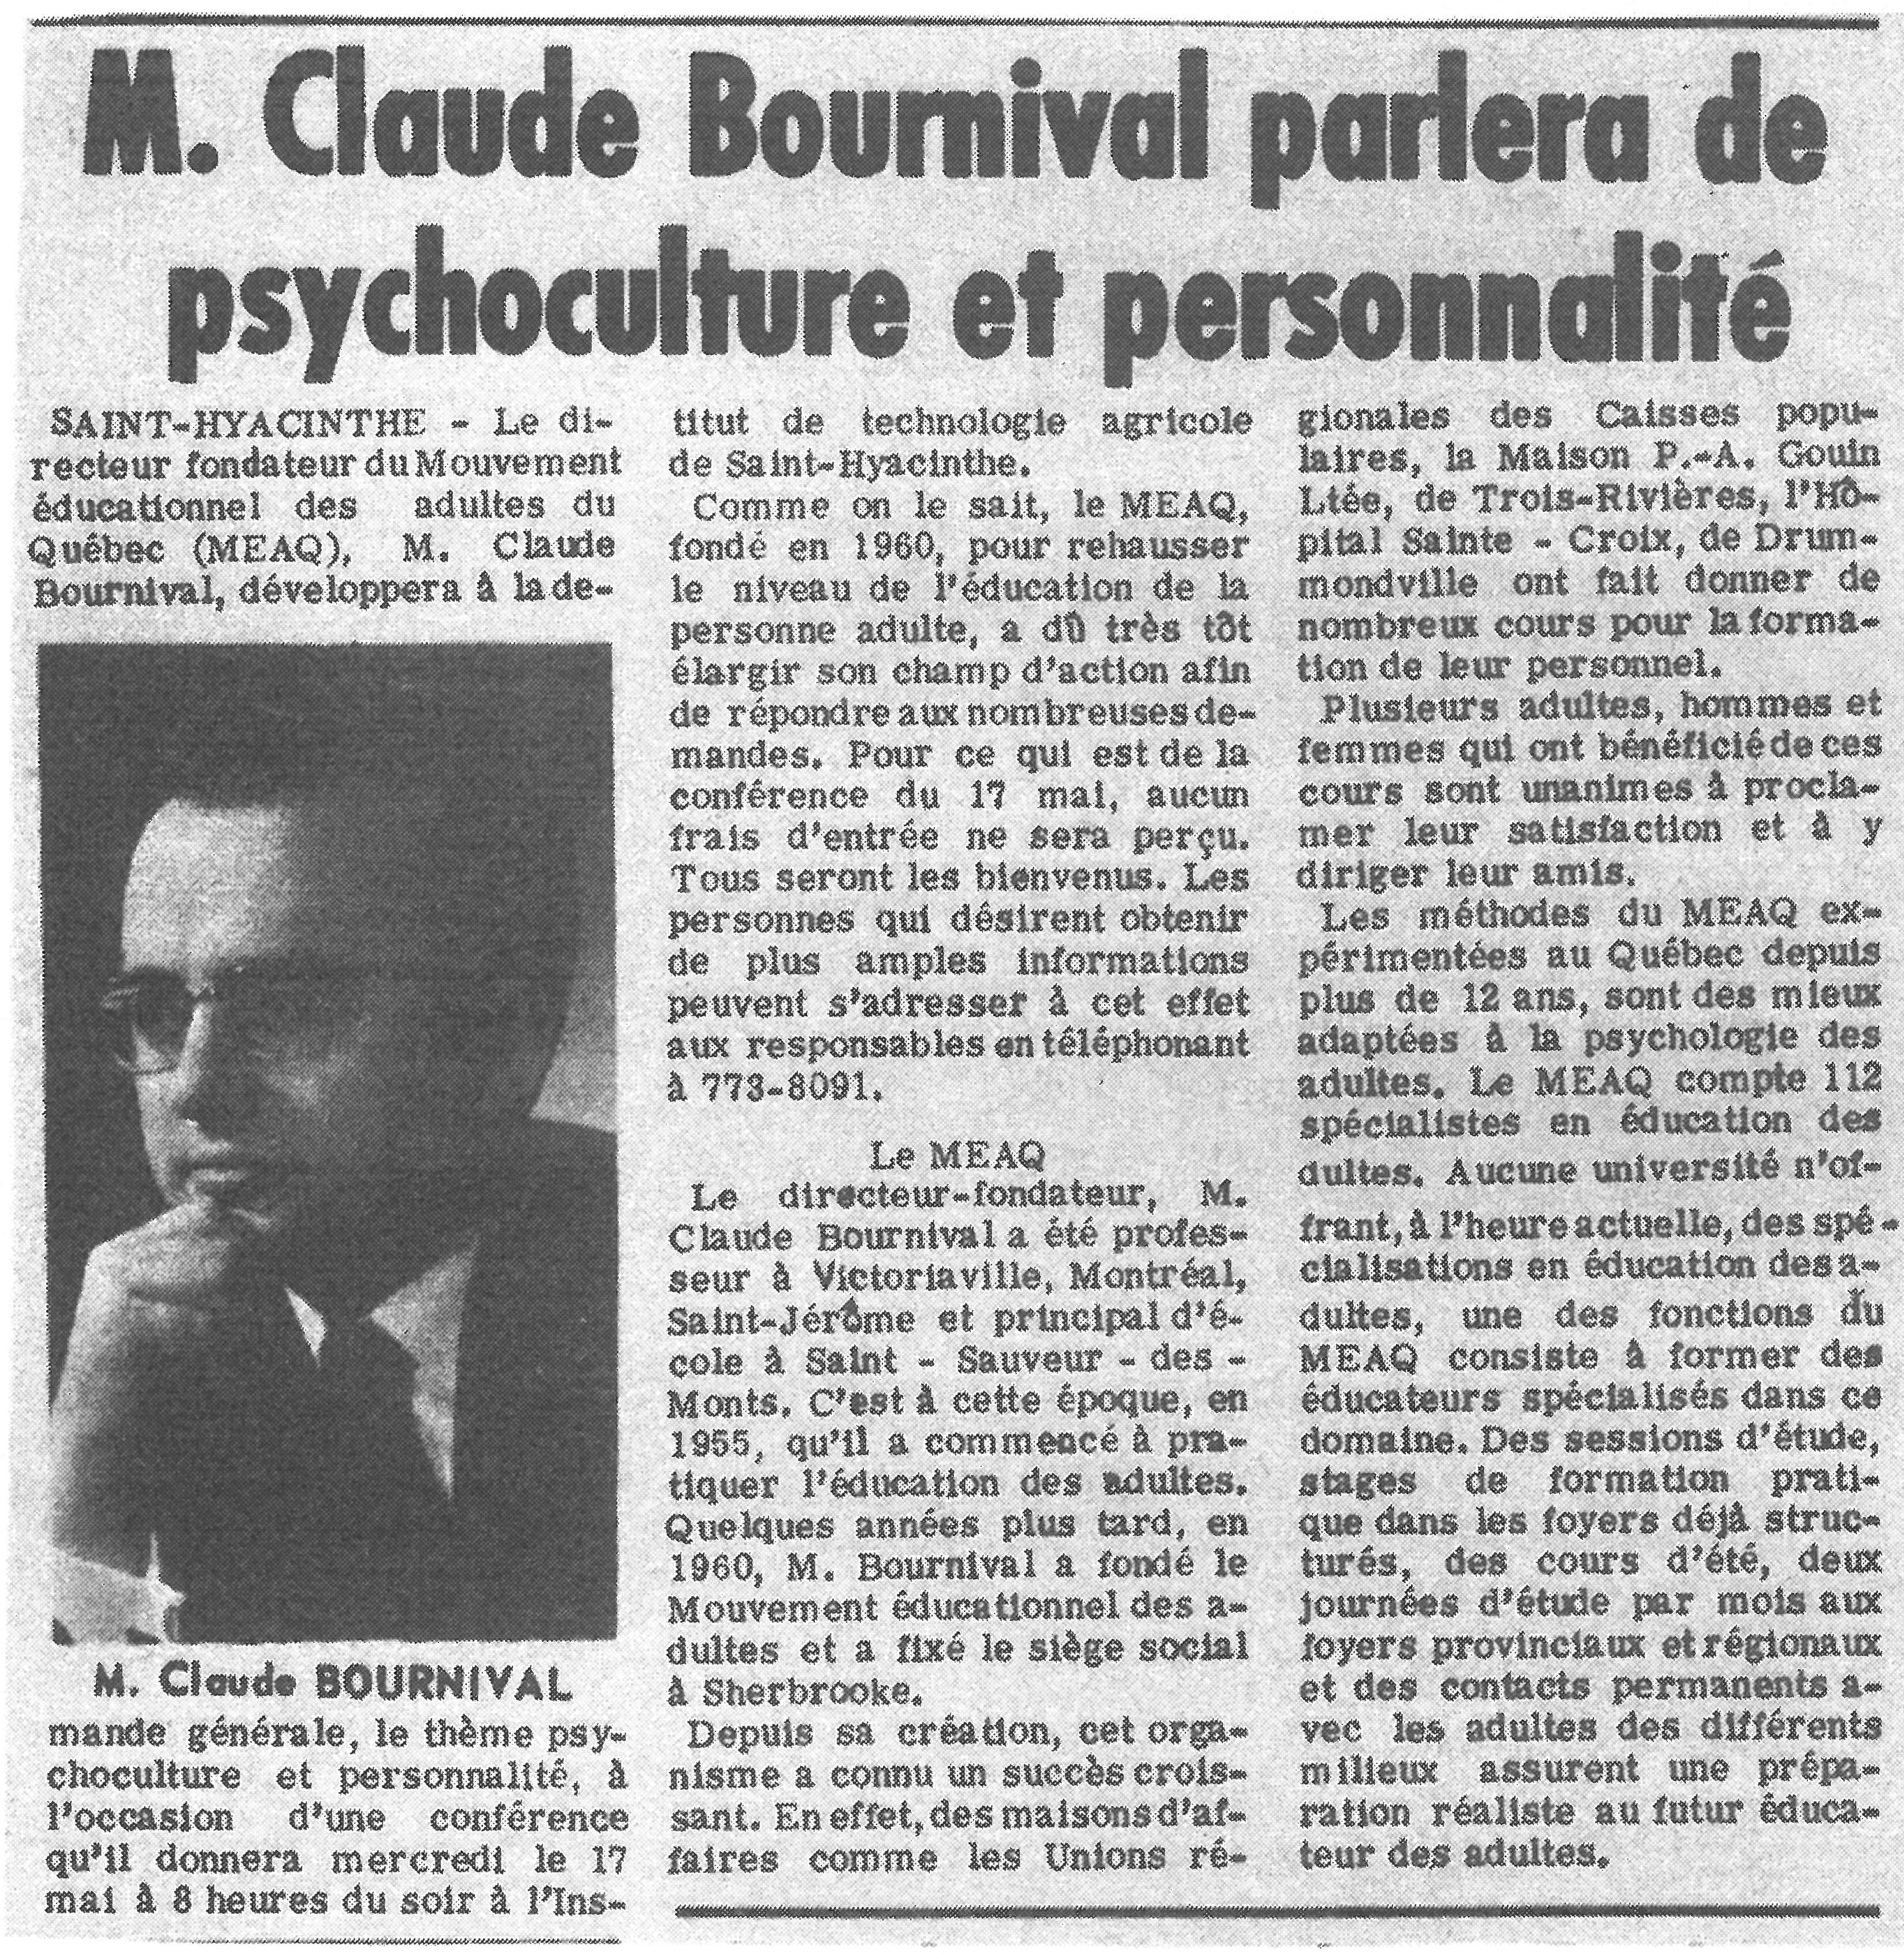 Claude Bournival 1967